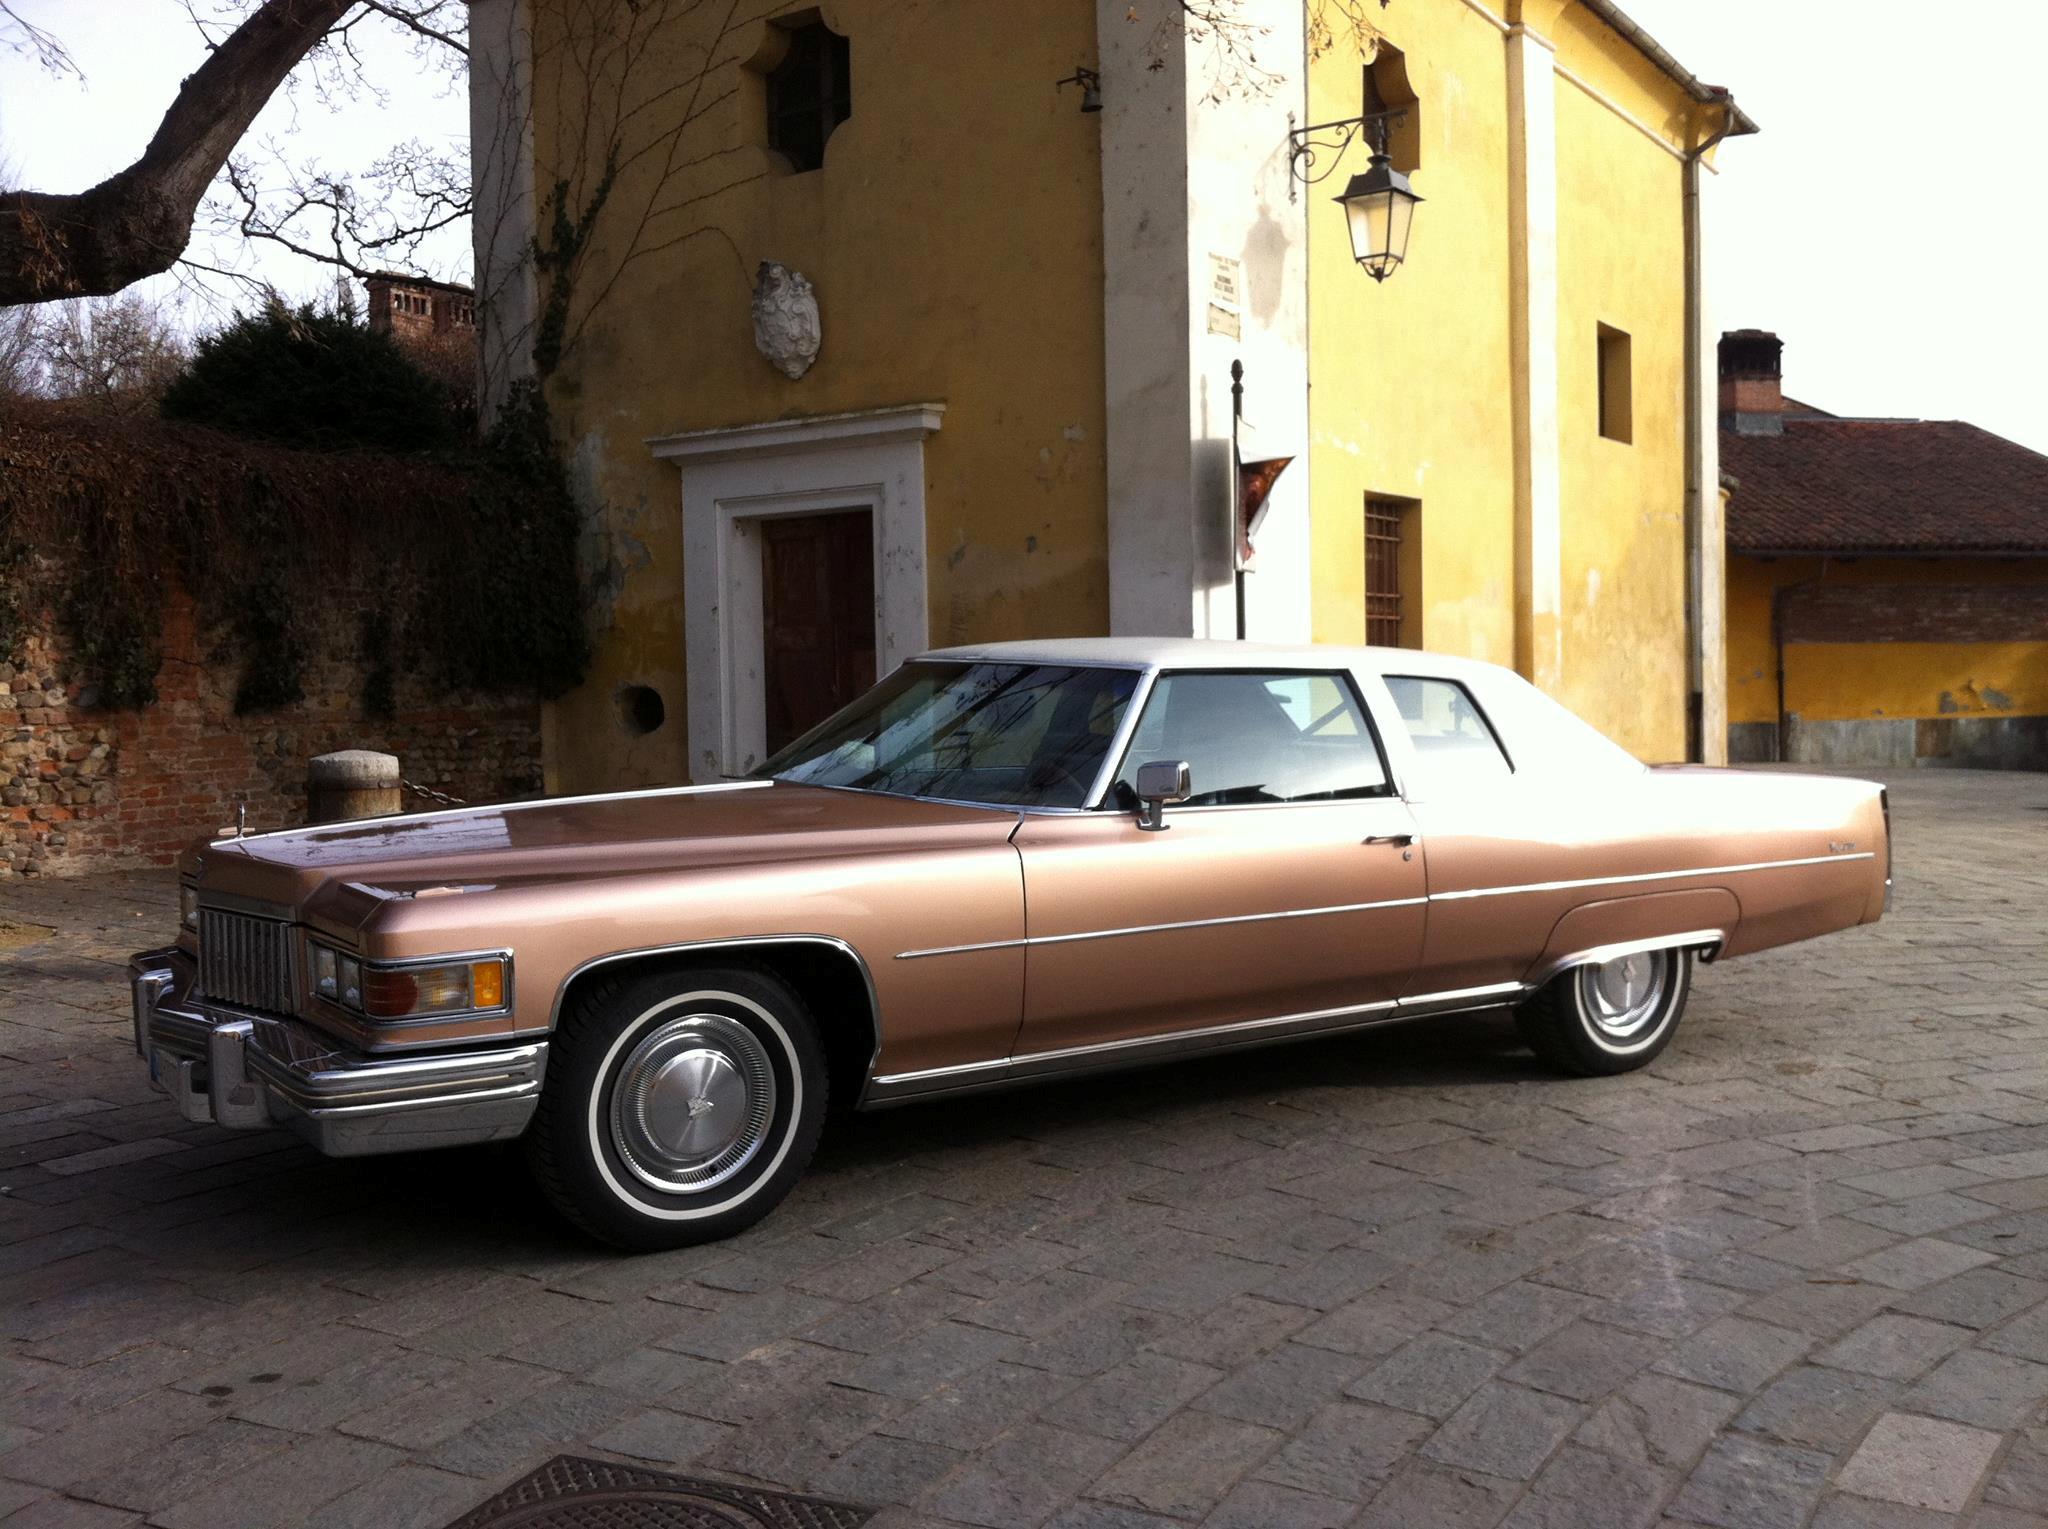 File:1975 Cadillac Coupe Deville fvl.jpg - Wikimedia Commons